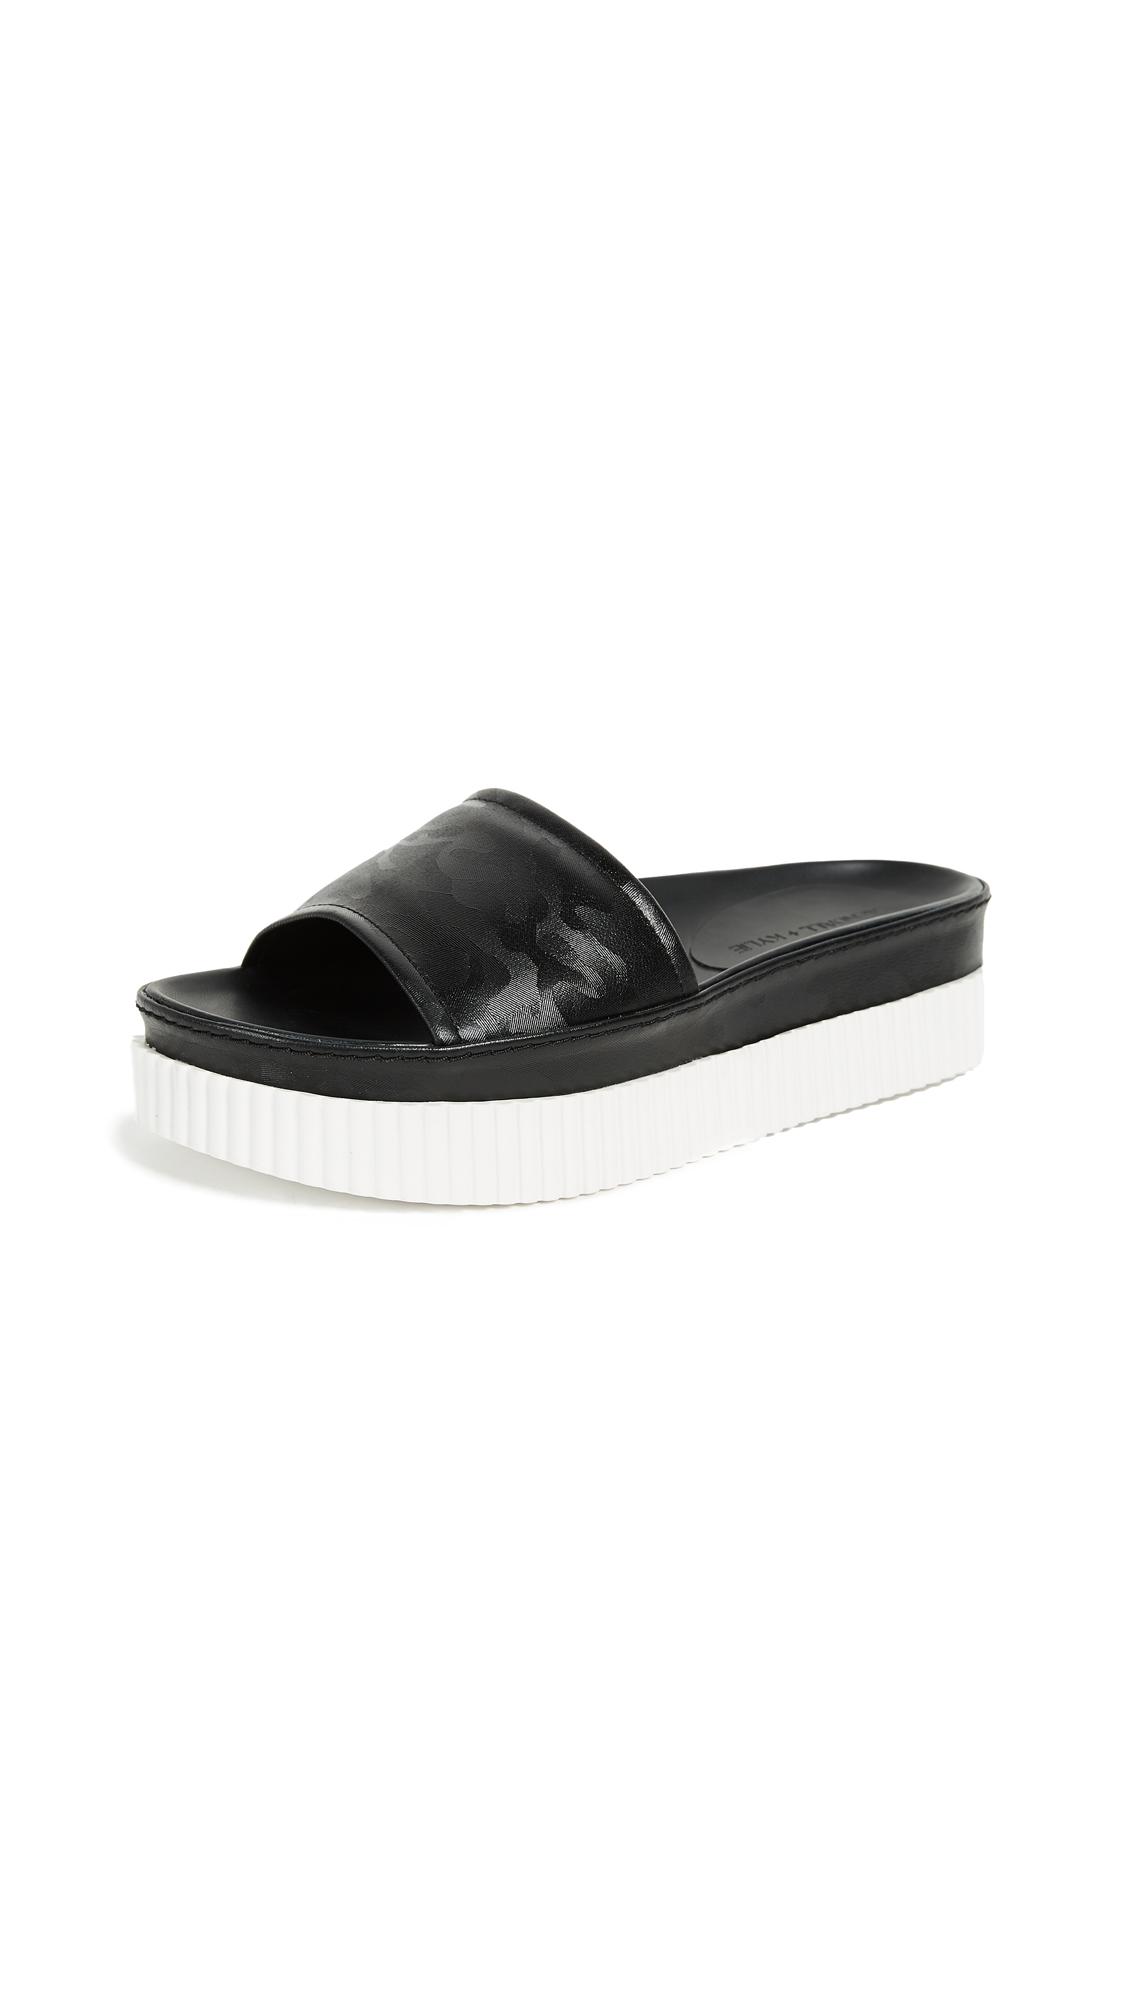 KENDALL + KYLIE Isla Platform Slides - Black Camo